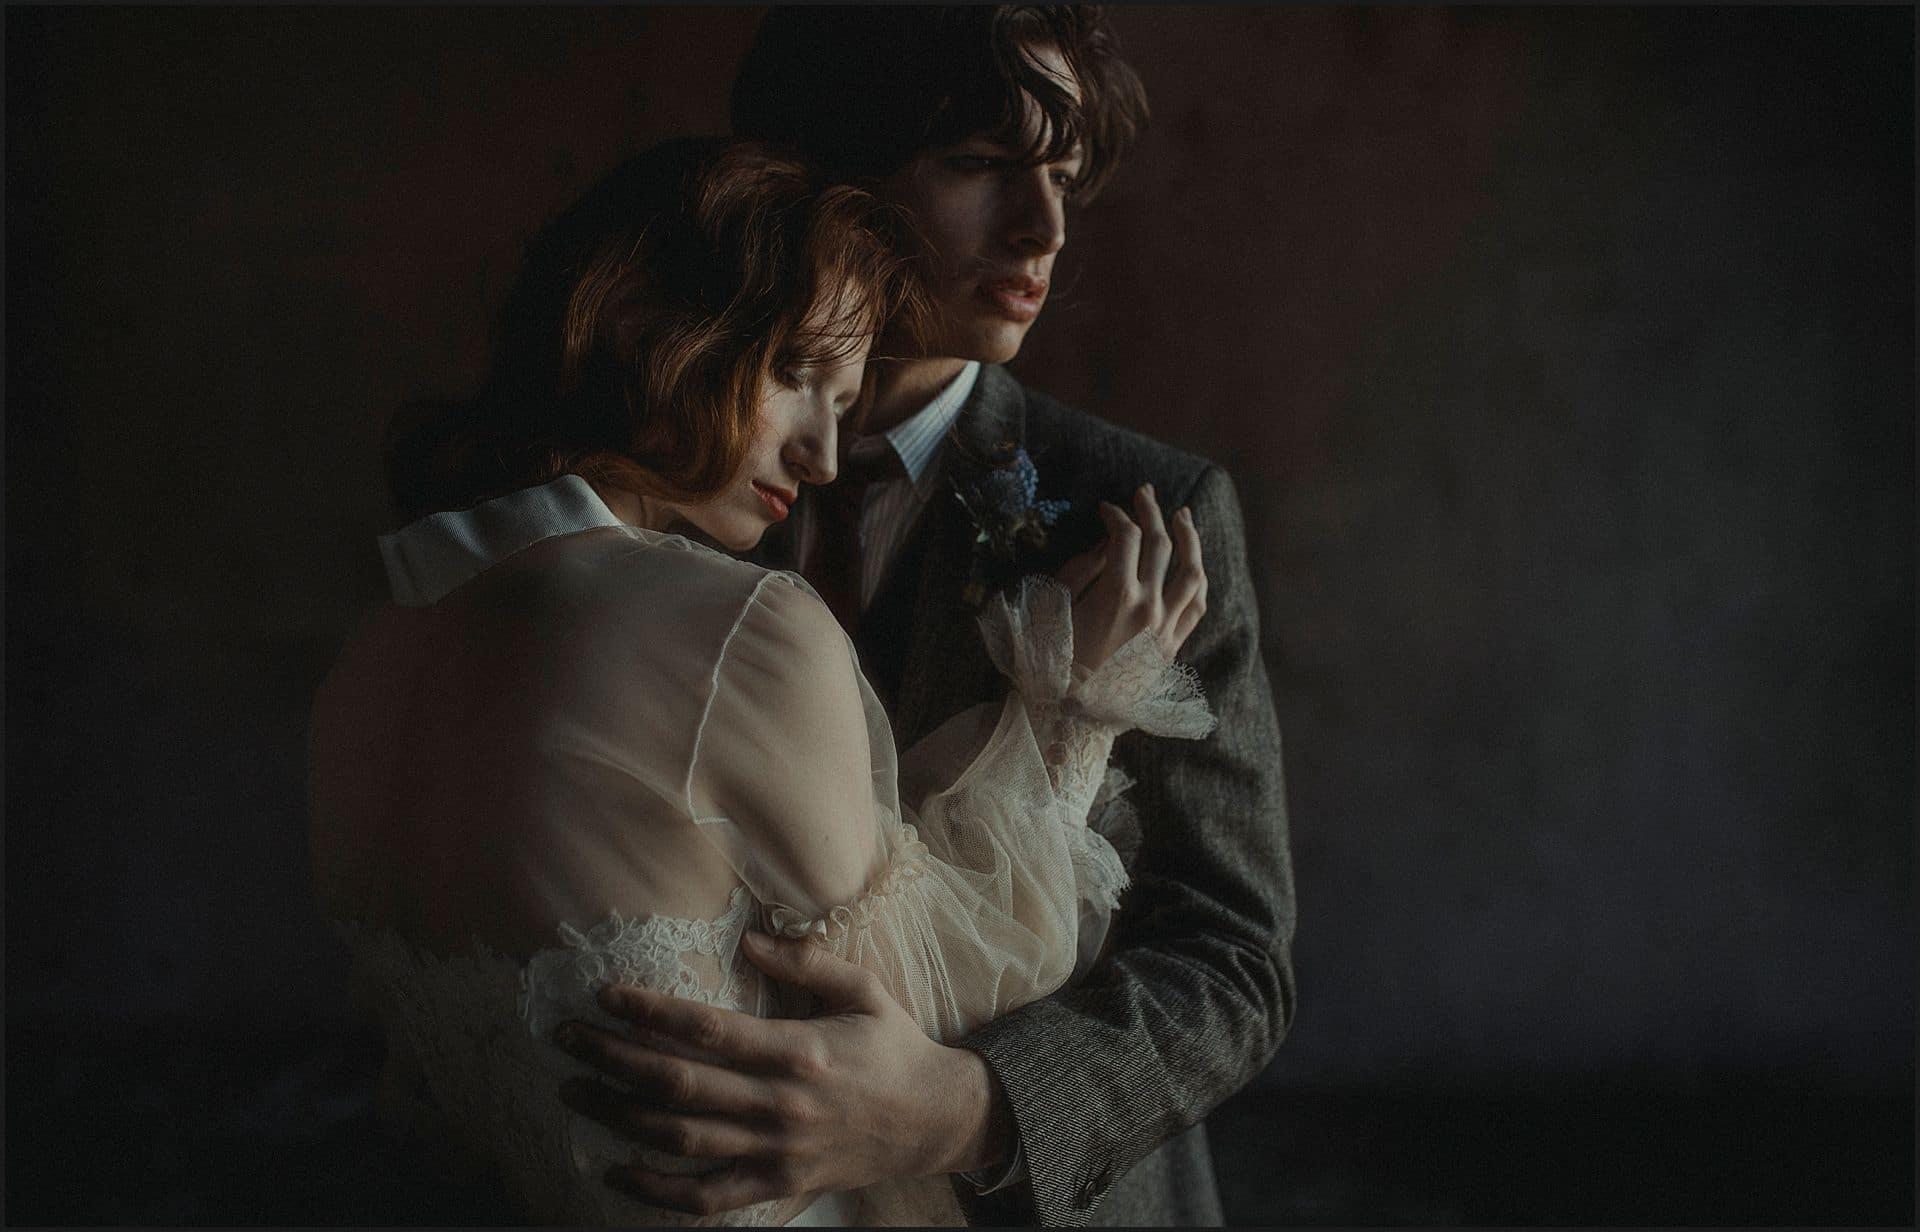 bride and groom, intimate portrait, romantic portrait, unconventional wedding, cross studio, milan, wedding photographer, wedding in italy